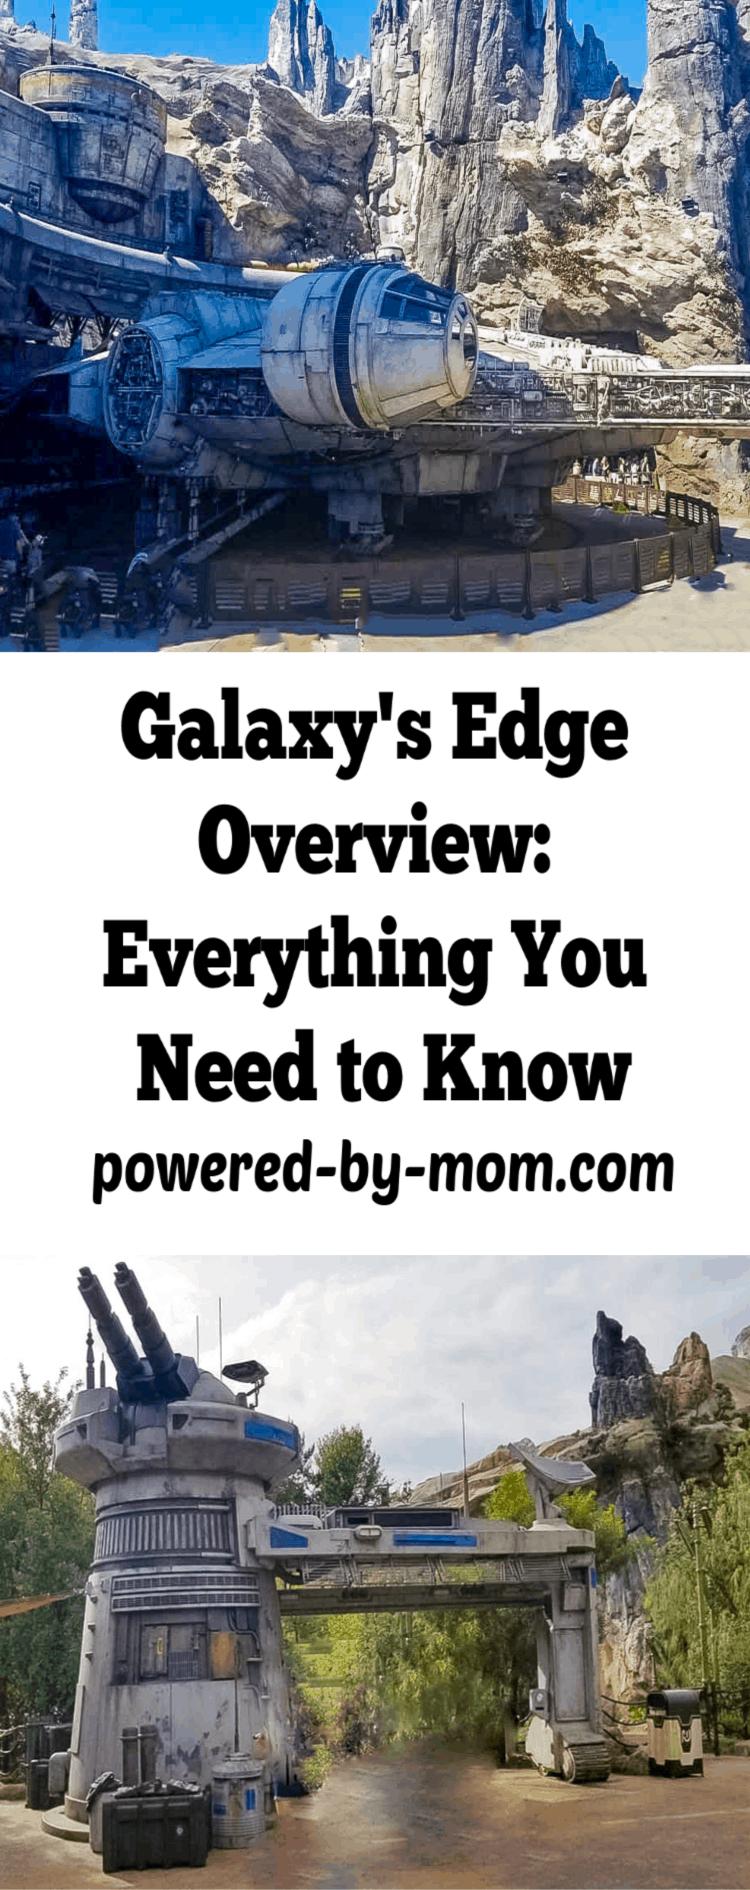 Galaxy's edge, star wars, disneyland, galaxy's edge food, galaxy's edge shops, galaxy's edge attractions, galaxy's edge story